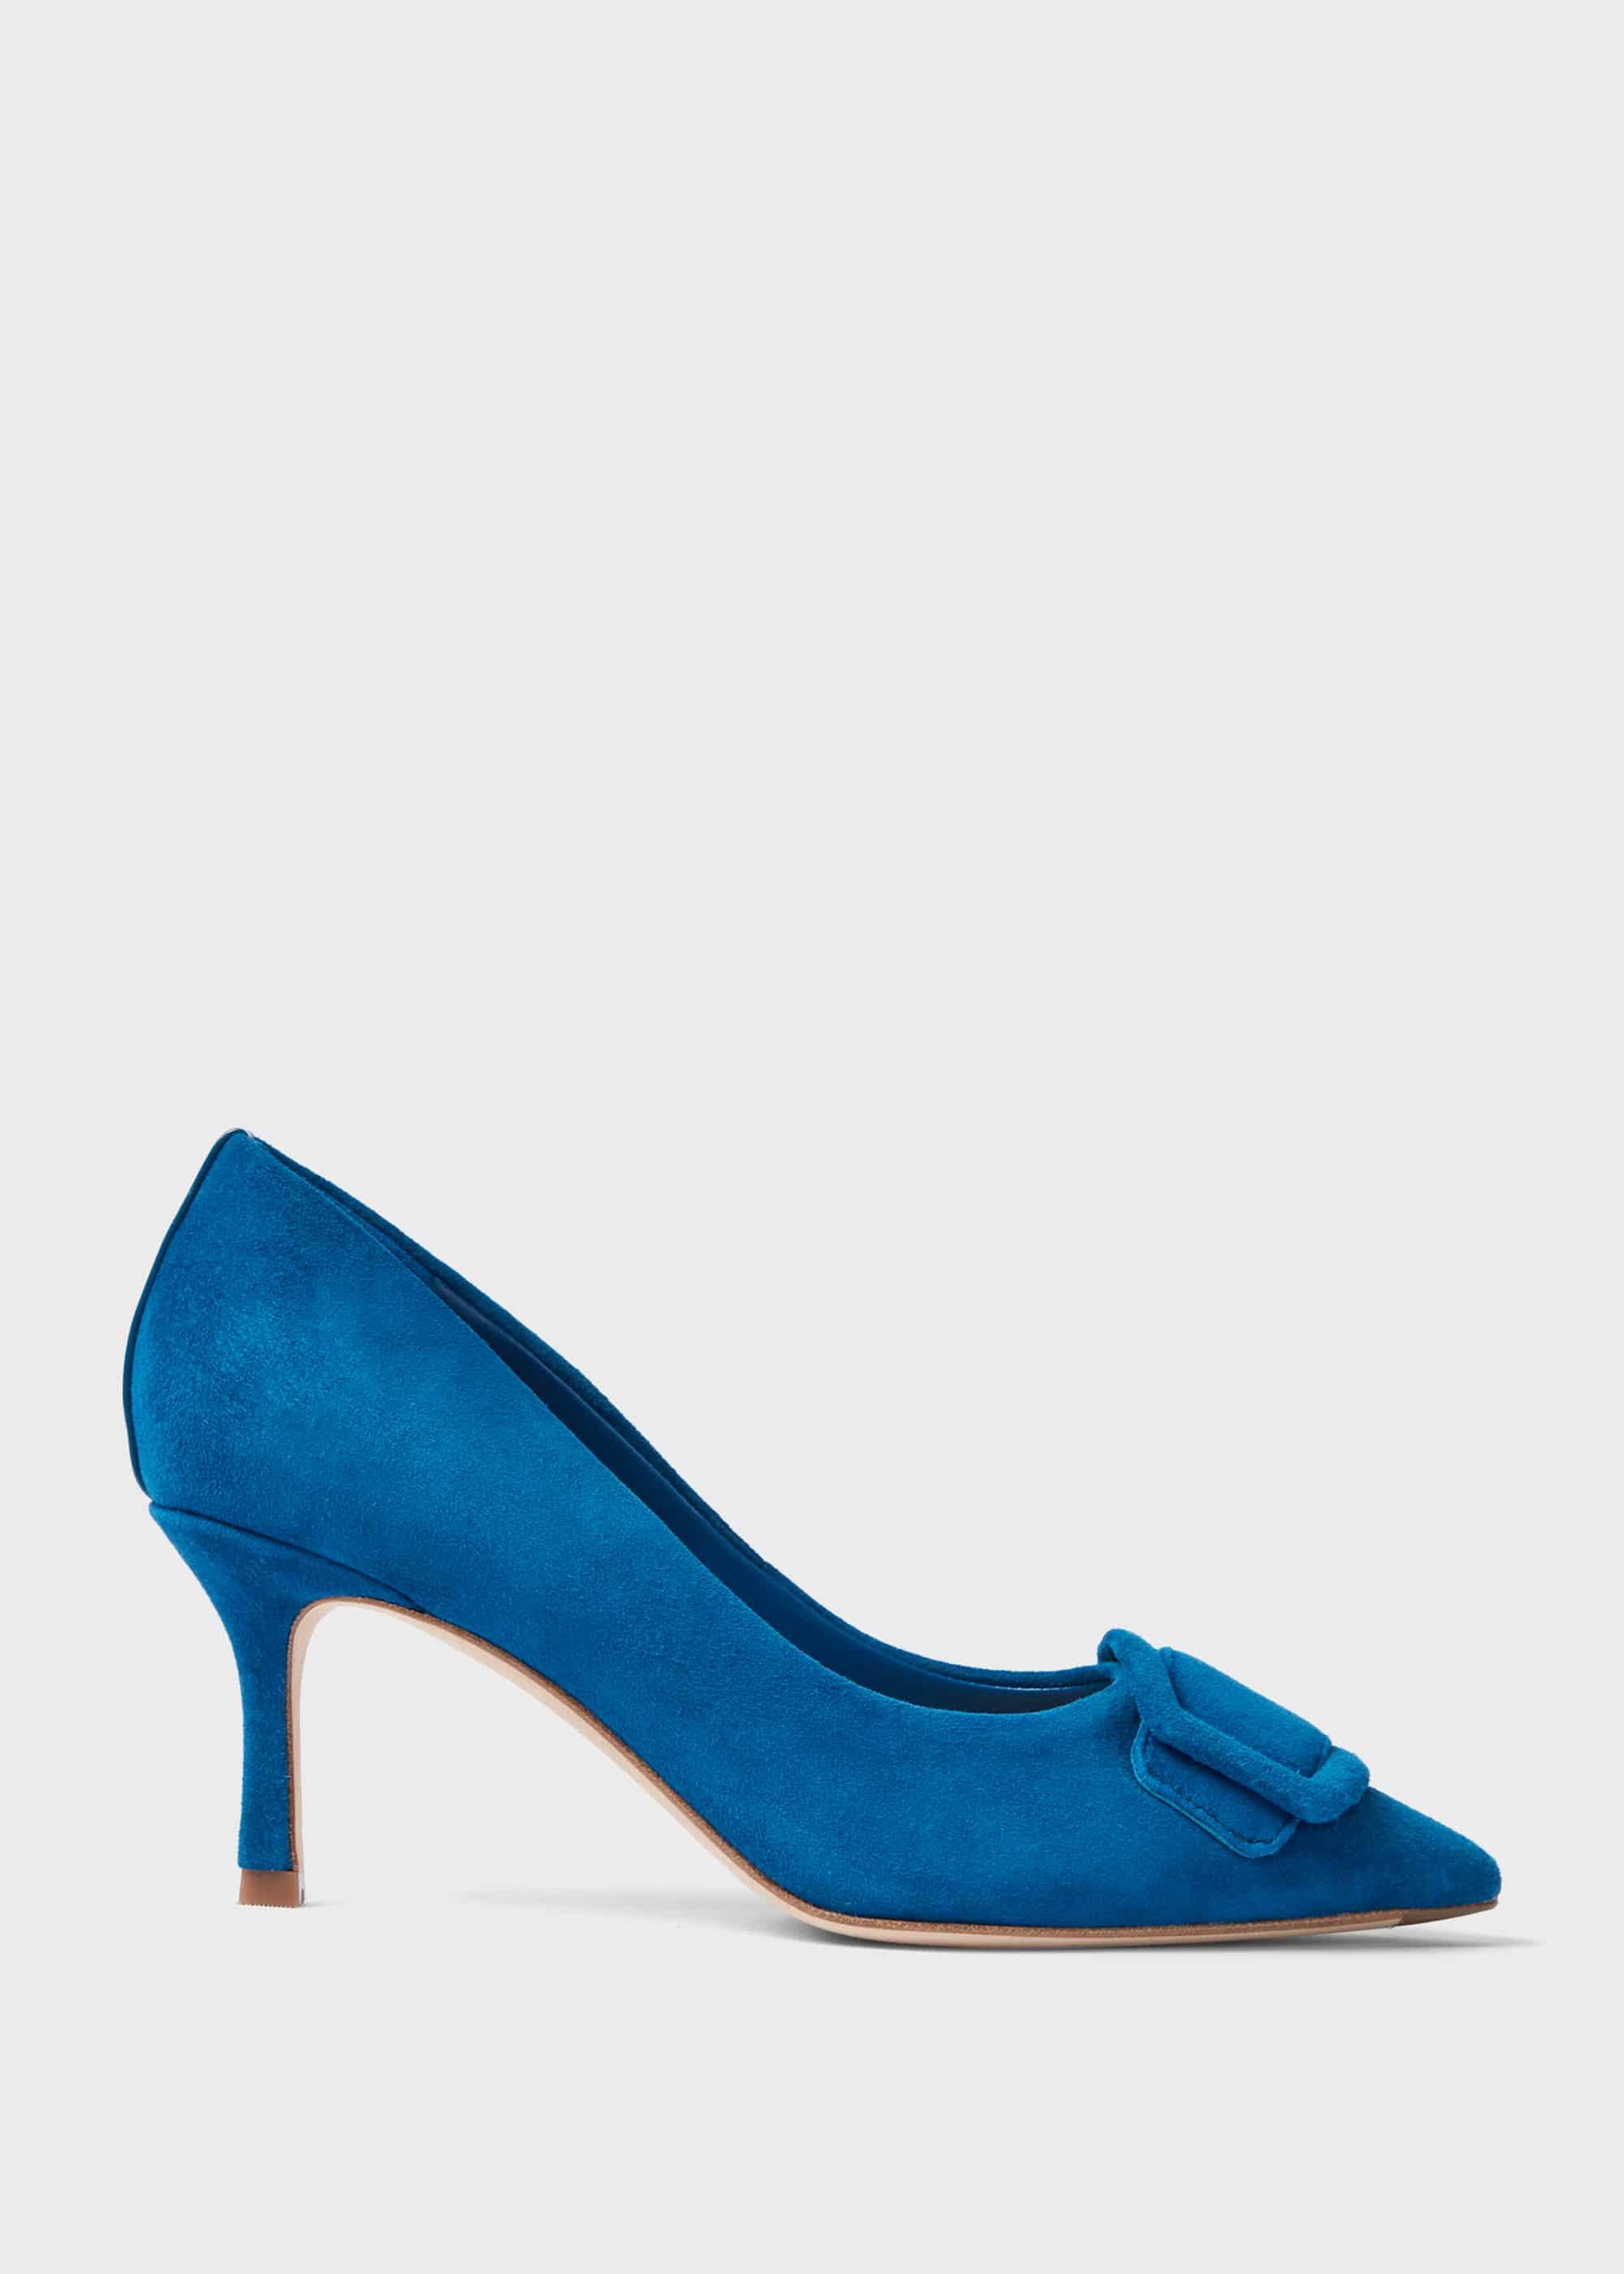 Hobbs Women Alison Suede Stiletto Court Shoes